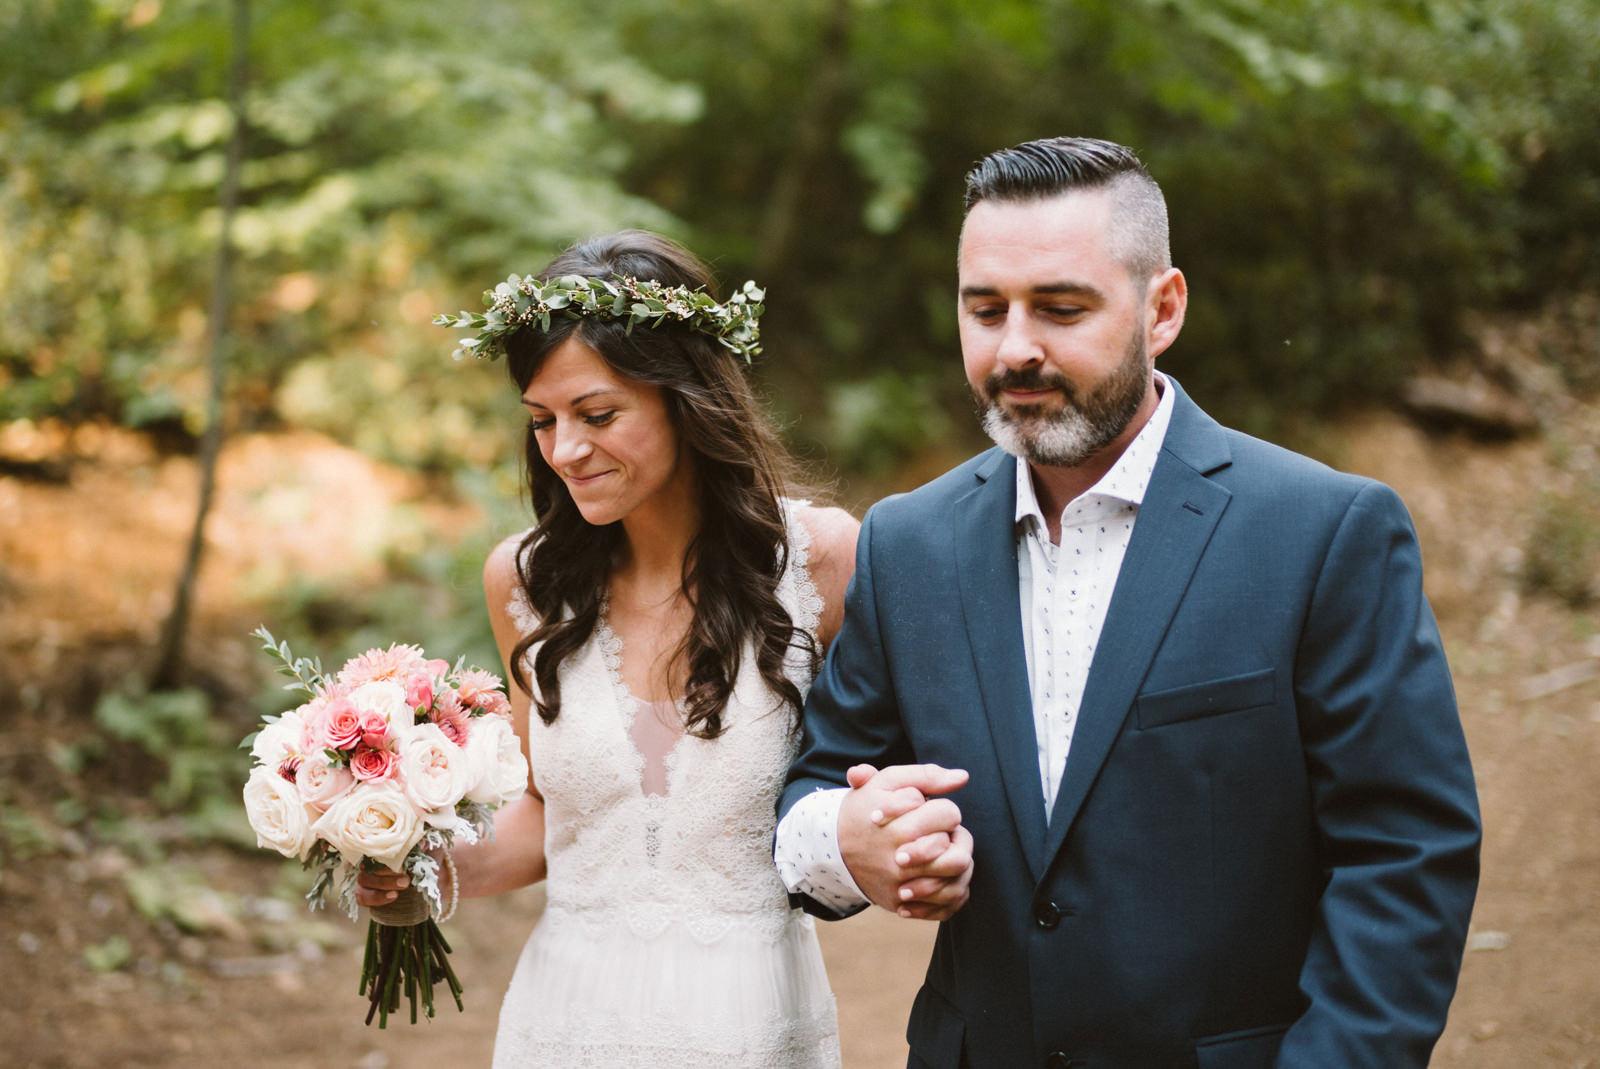 yosemite-intimate-wedding-040 YOSEMITE INTIMATE WEDDING